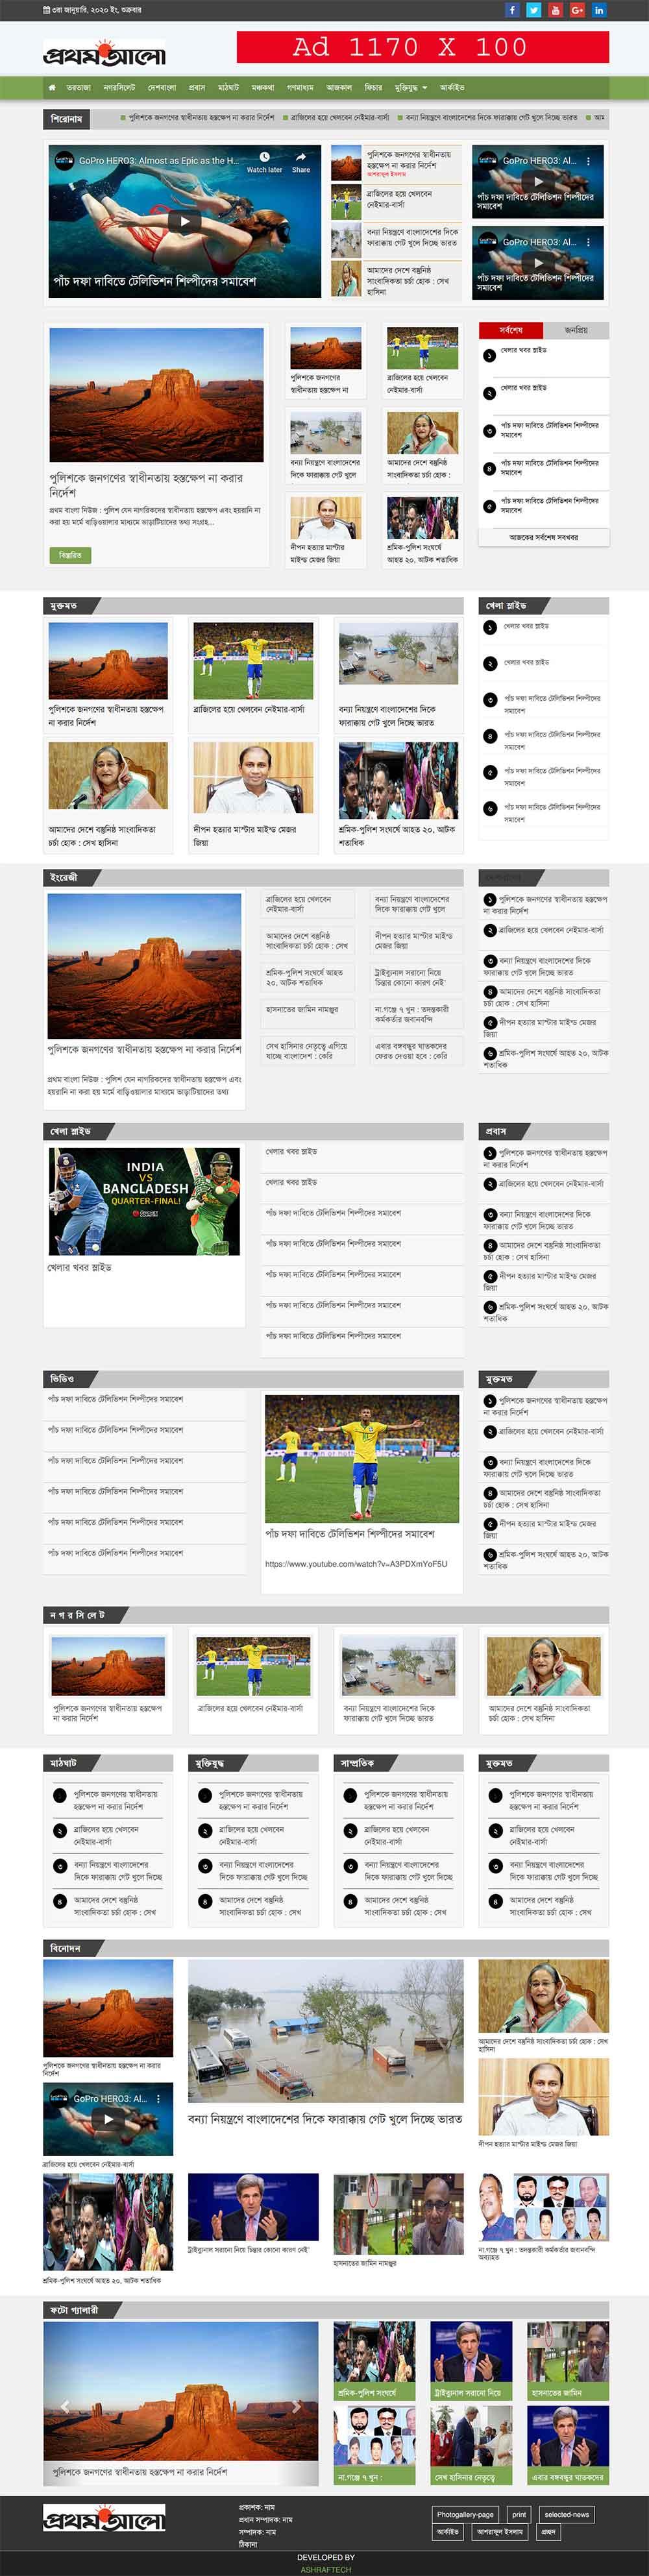 WordPress News Theme (Super Star news)